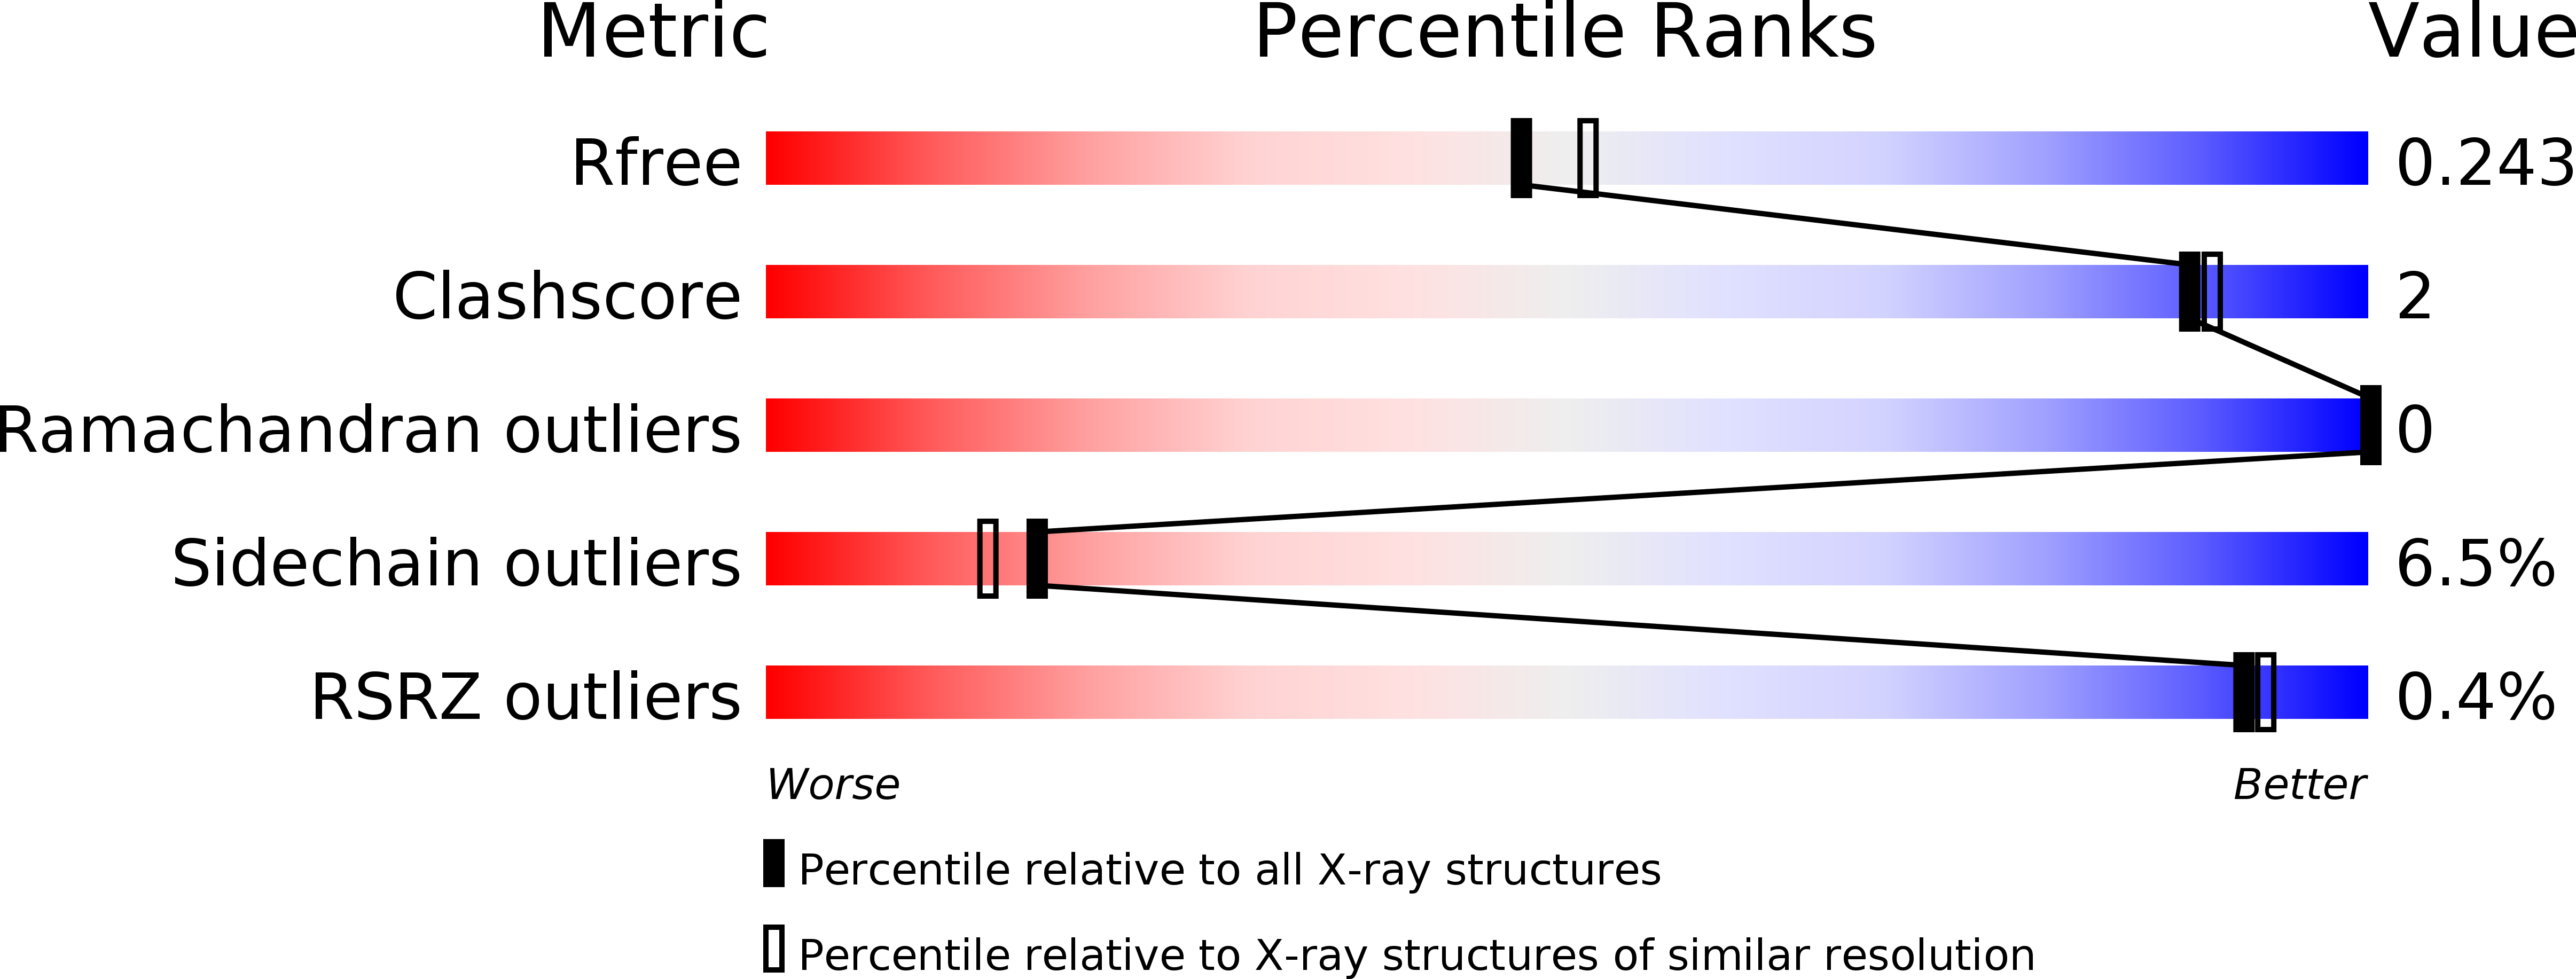 RCSB PDB - 6NZQ: CRYSTAL STRUCTURE OF TYROSINE KINASE 2 JH2 (PSEUDO